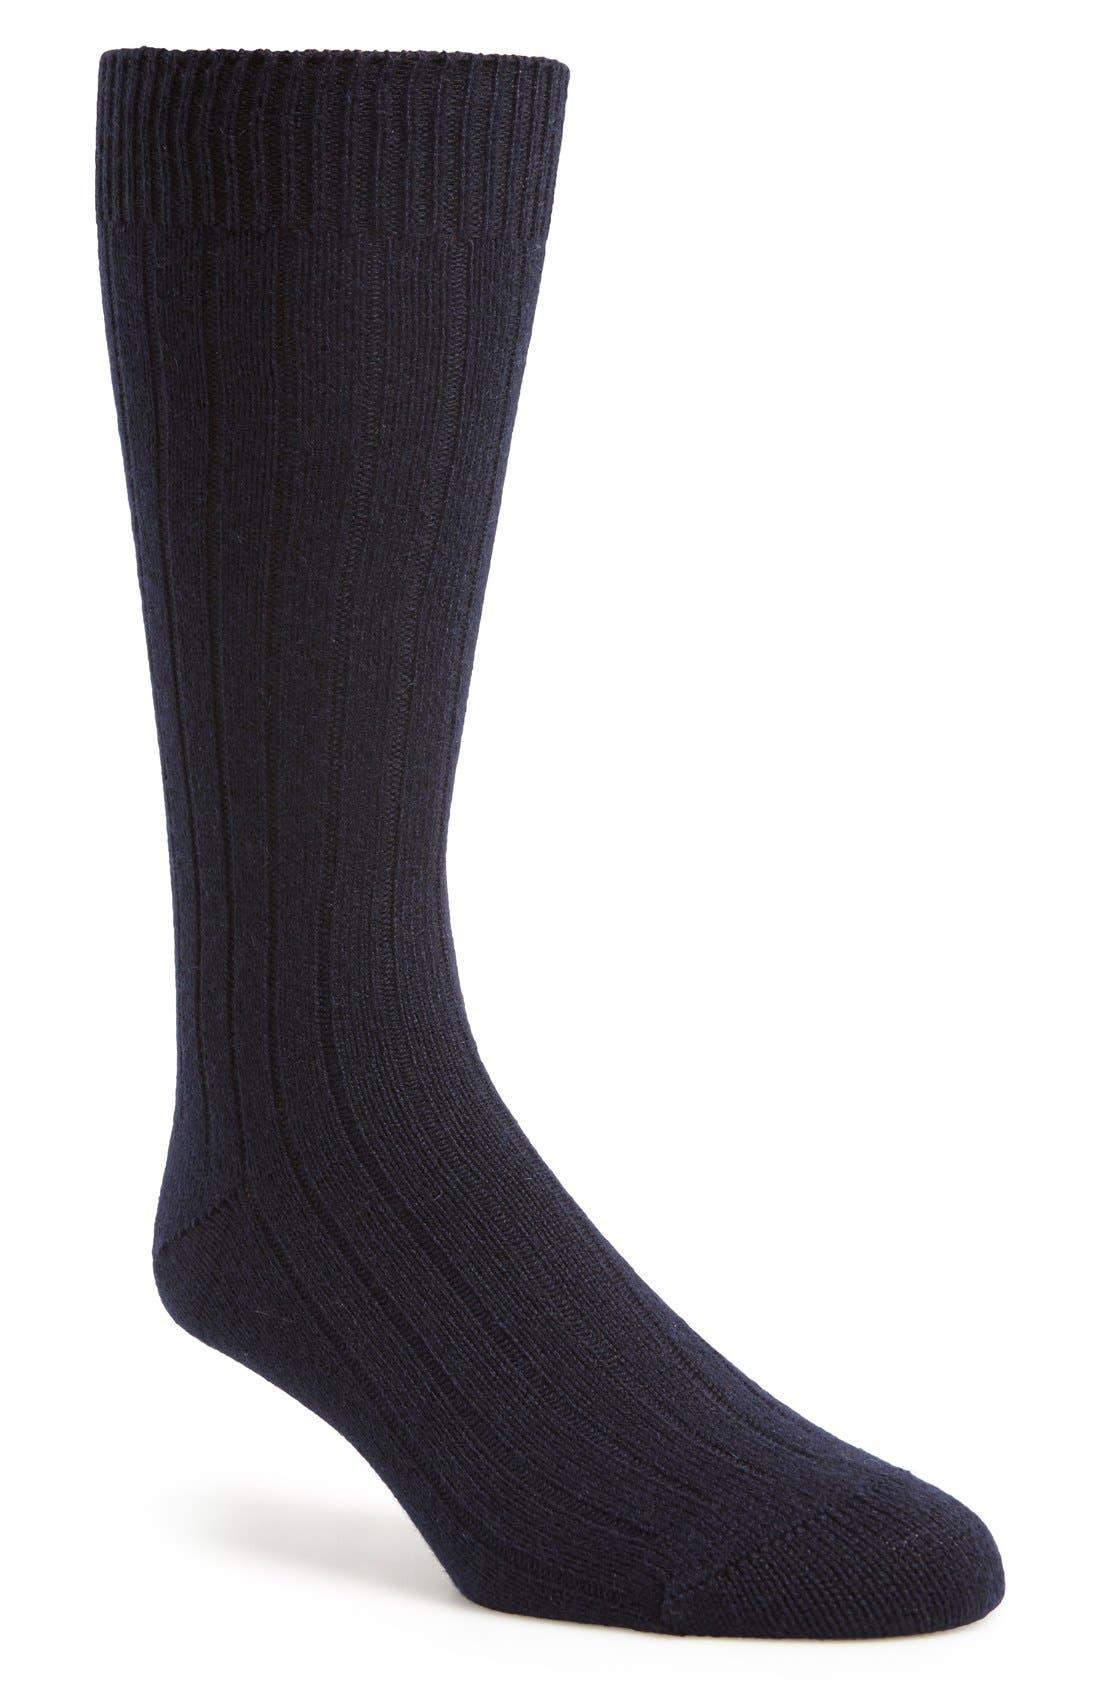 'Waddington' Cashmere Blend Mid Calf Socks,                         Main,                         color, Navy